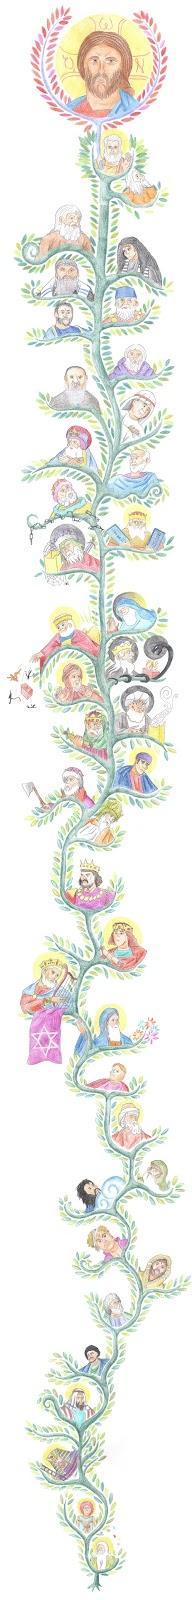 Matthew 1:17 (Tree of Jesse / Genealogy of Christ) by Parastos